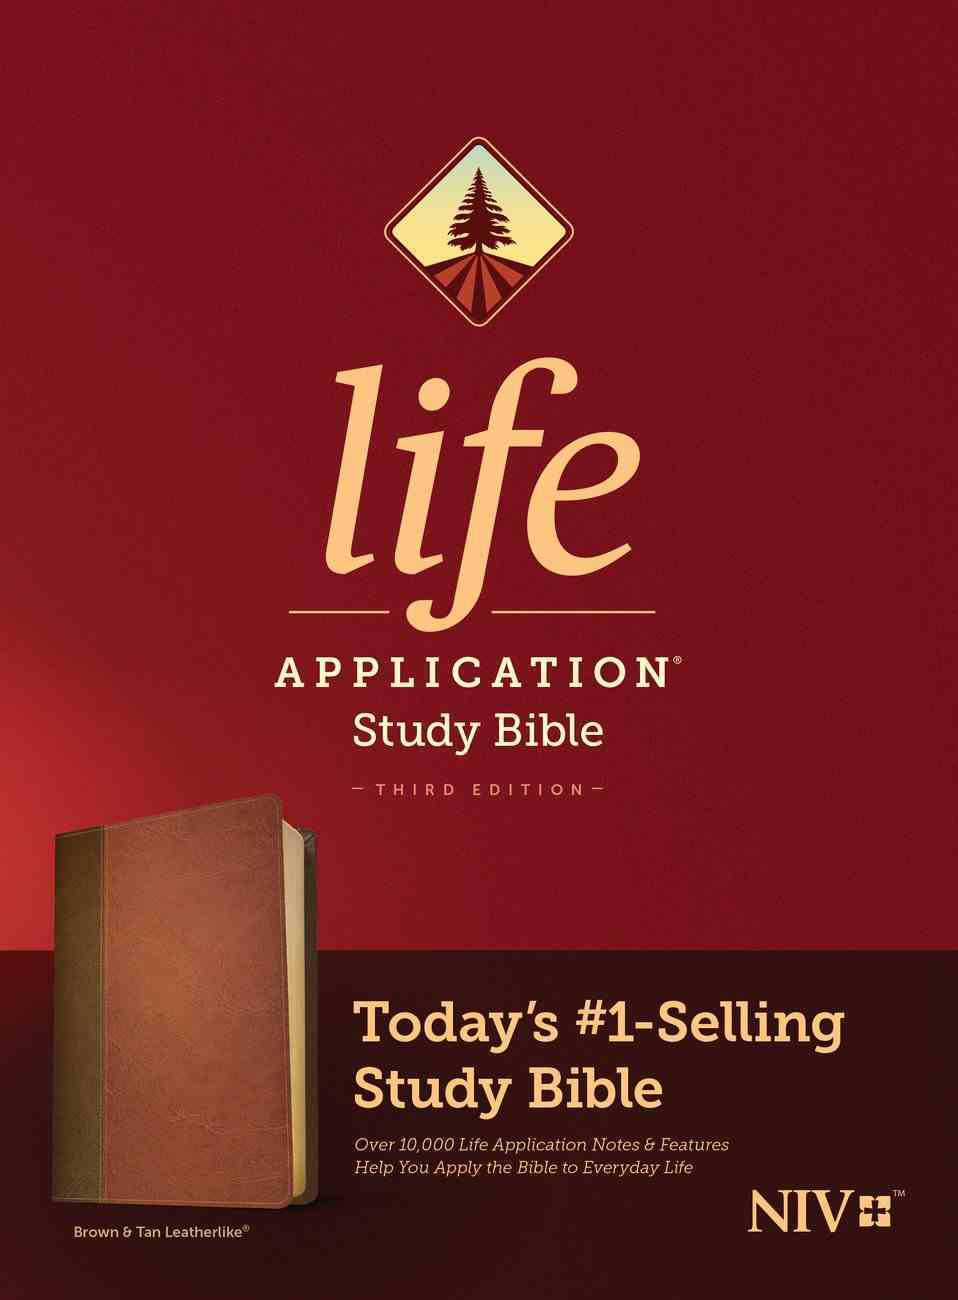 NIV Life Application Study Bible 3rd Edition Brown/Mahogany (Black Letter Edition) Imitation Leather